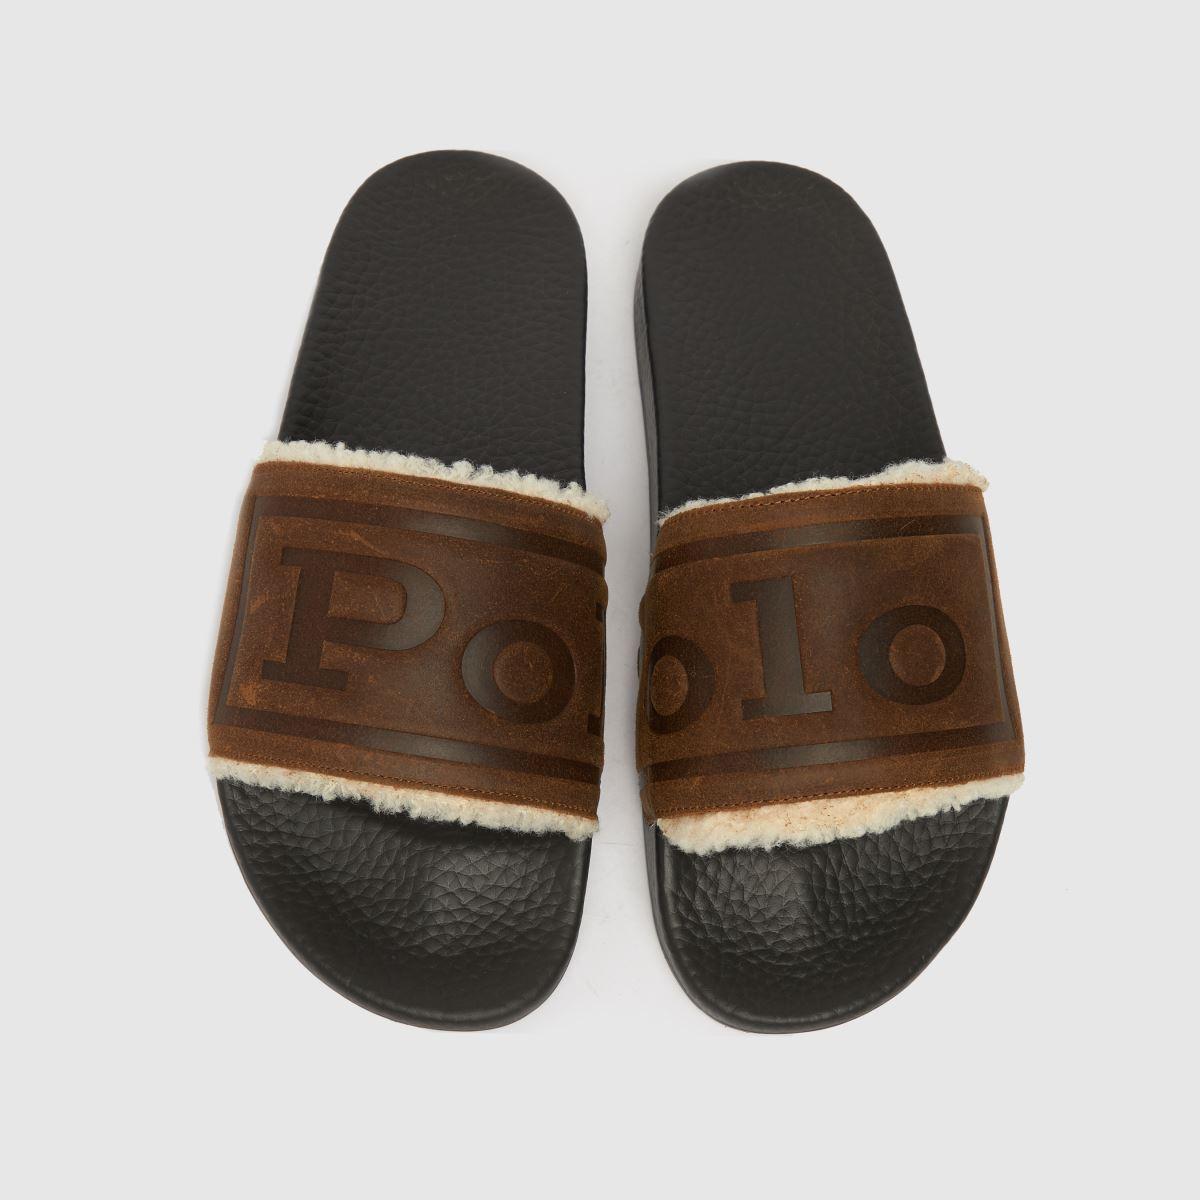 Polo Ralph Lauren Brown Cayson Slide Shearling Sandals